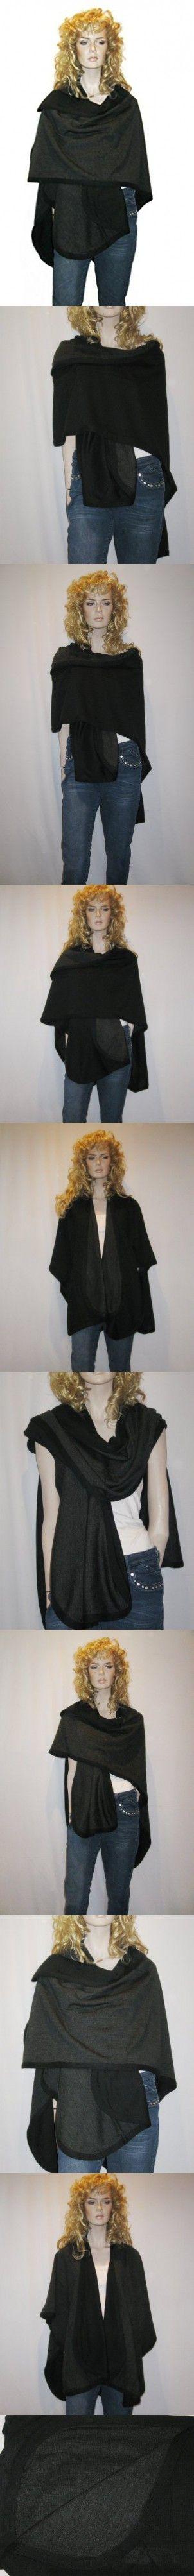 Cashmere Pashmina Group- Cape Woolen Reversible Ruana Knitted Poncho Shawl Cardigans Sweater Coat (Black/Charcoal)